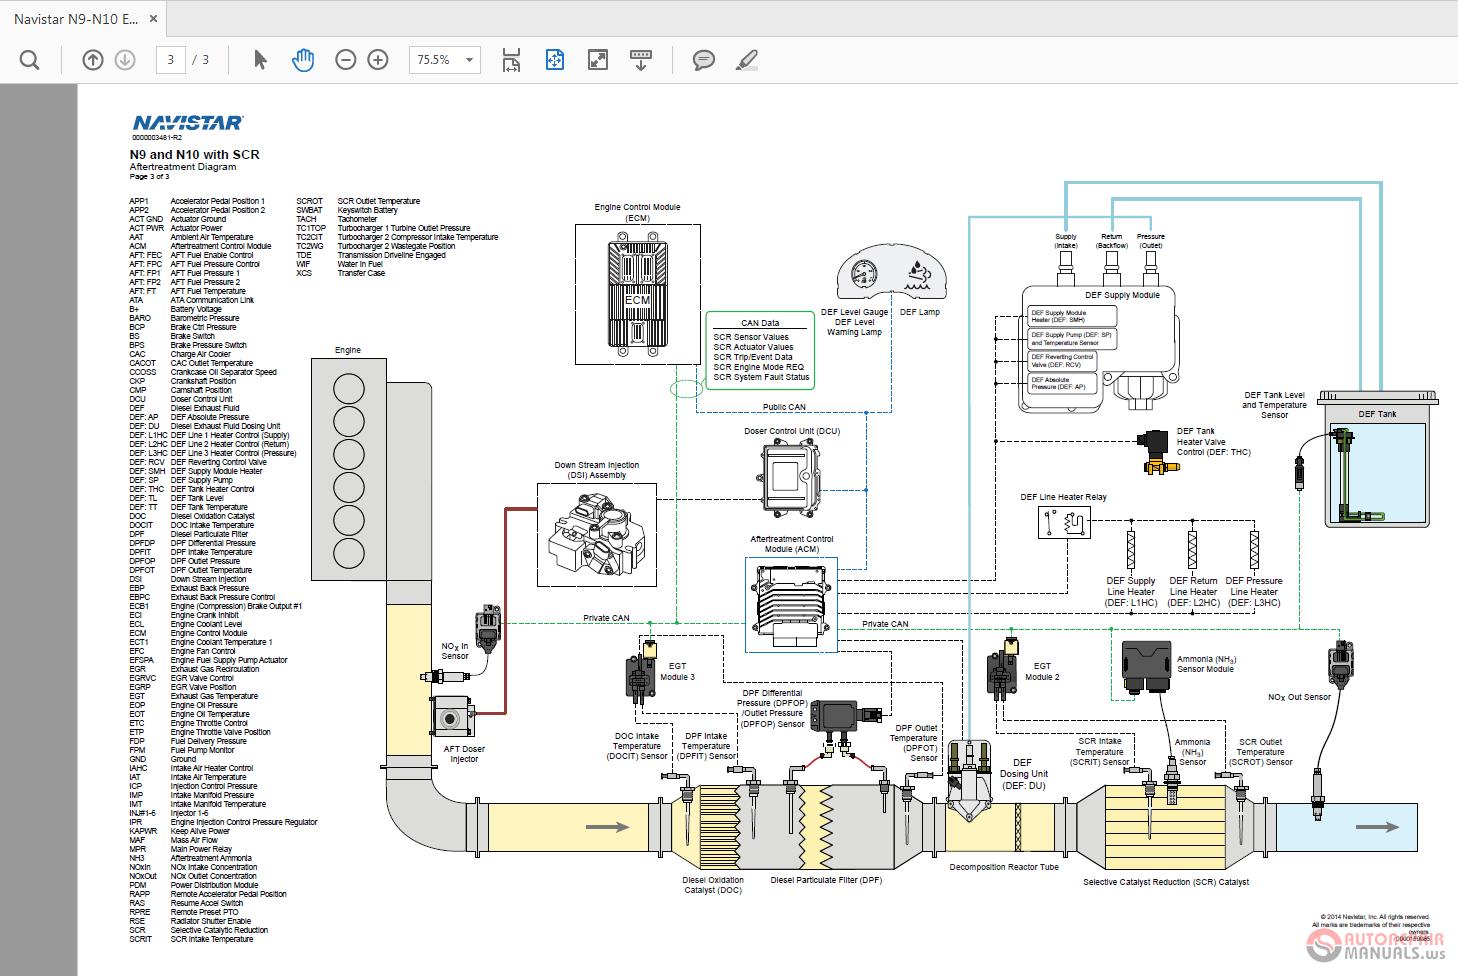 Navistar N9-N10 Engine Wiring Diagrams | Auto Repair Manual